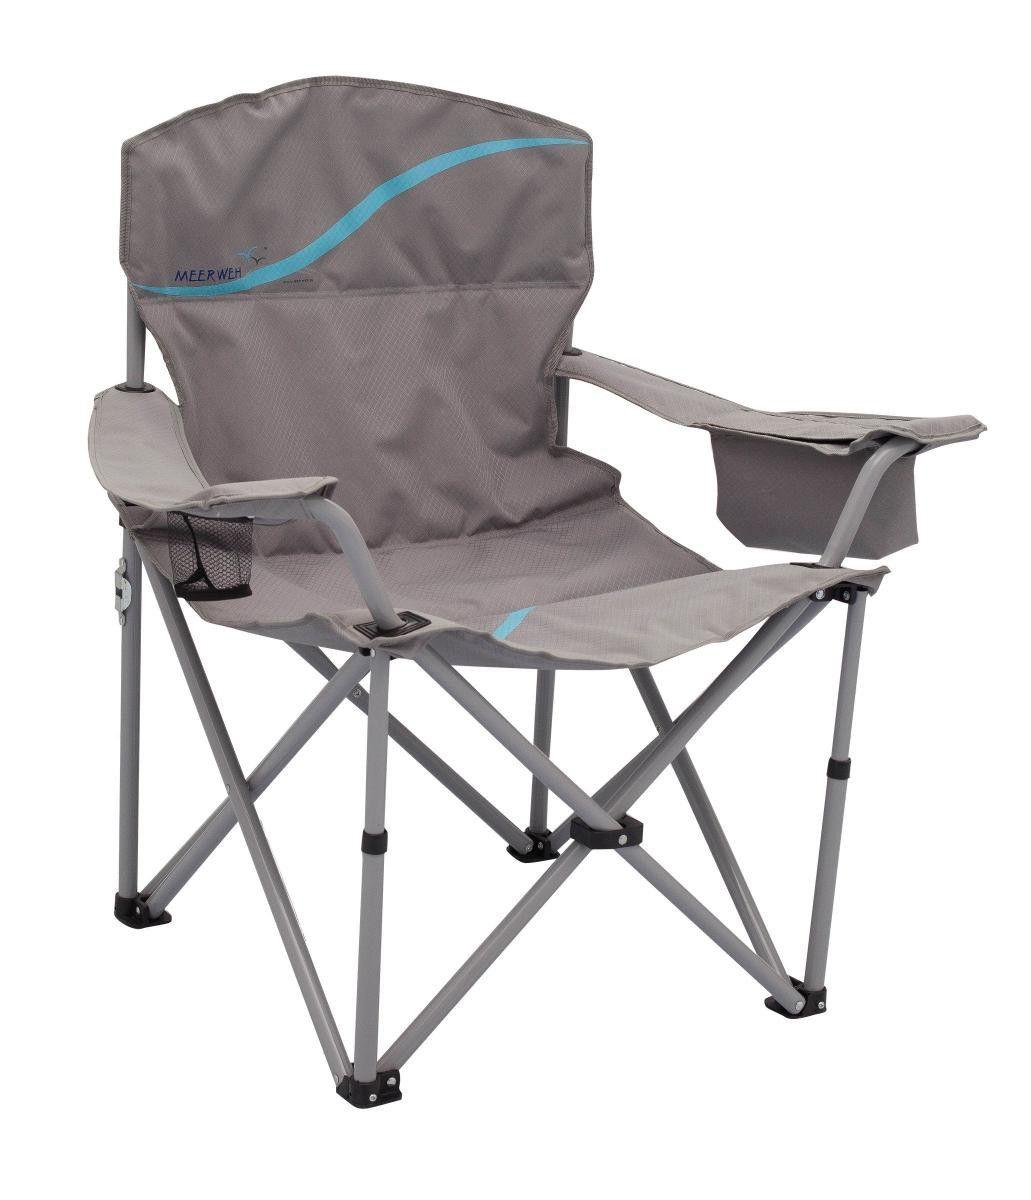 Meerweh Campingstuhl Faltstuhl Relaxstuhl grau blau Jetzt bestellen ...